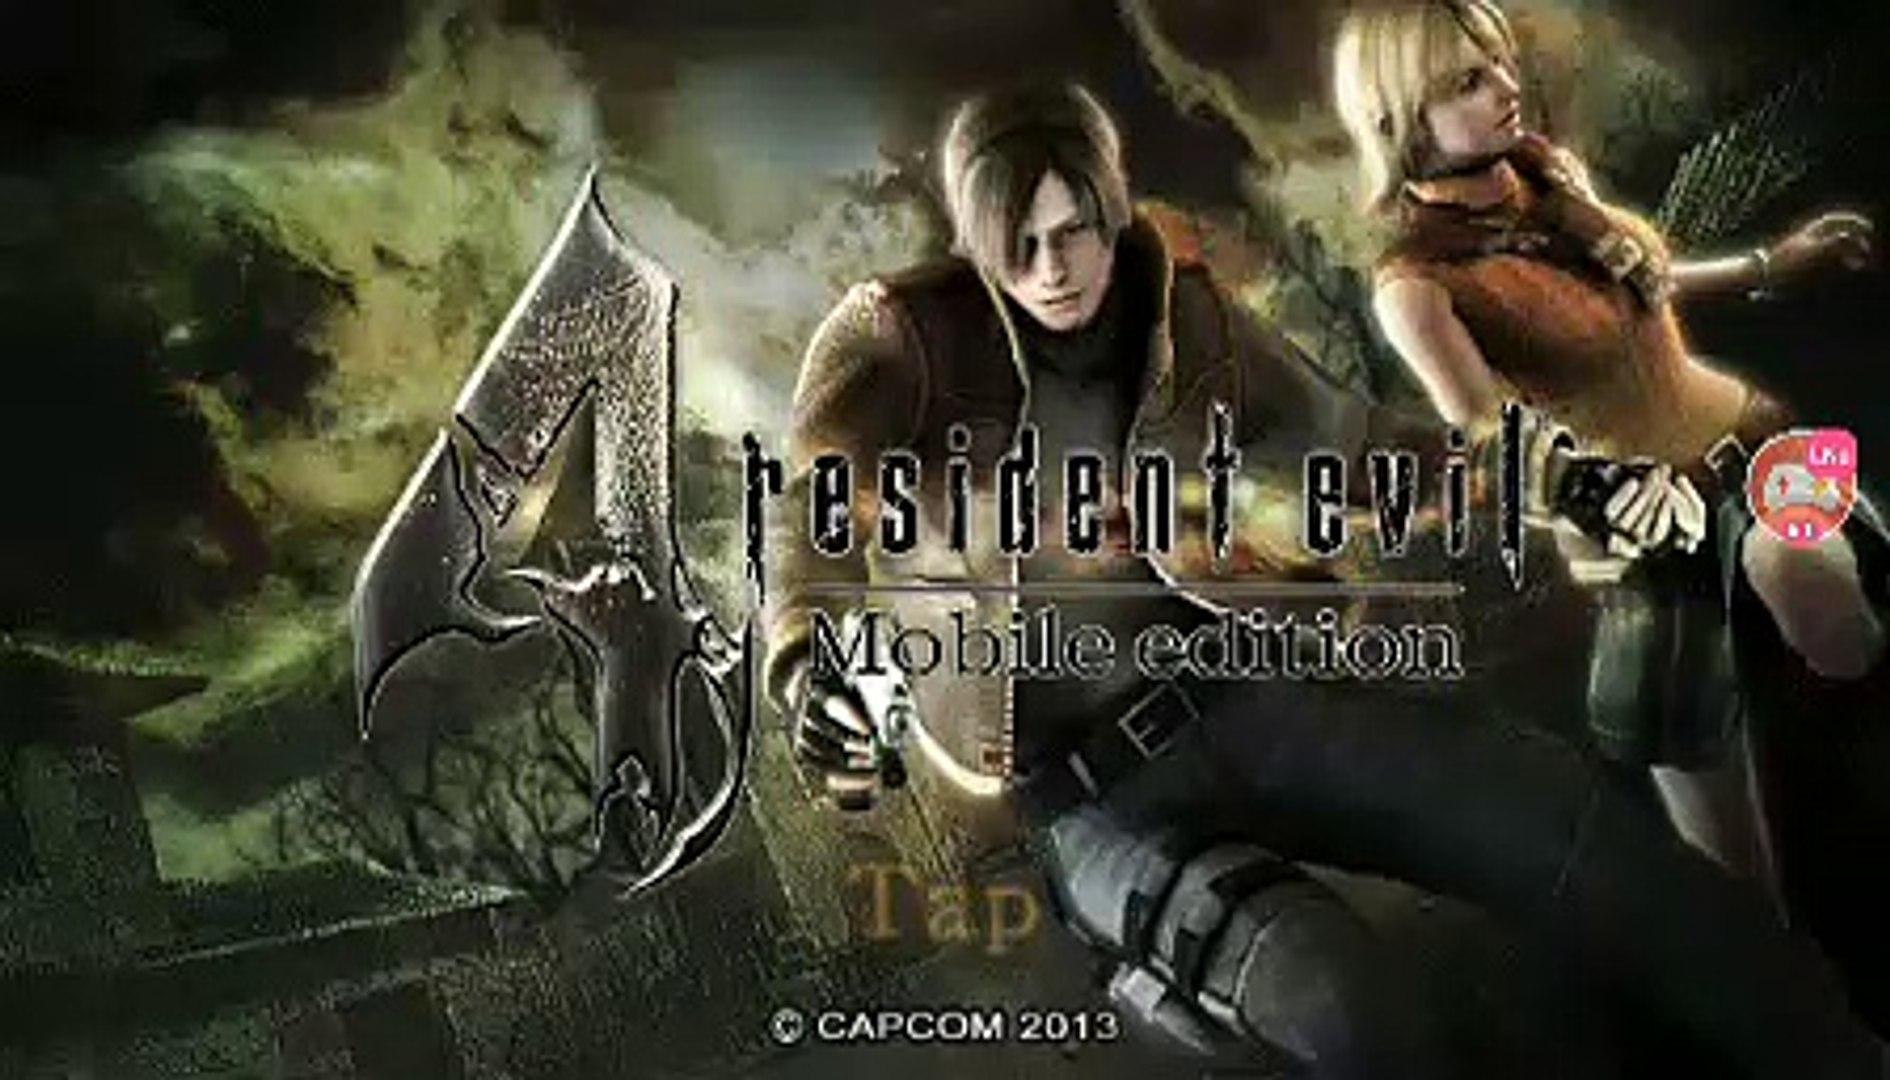 download-links-resident-evil-4-full-pc-game-compressed